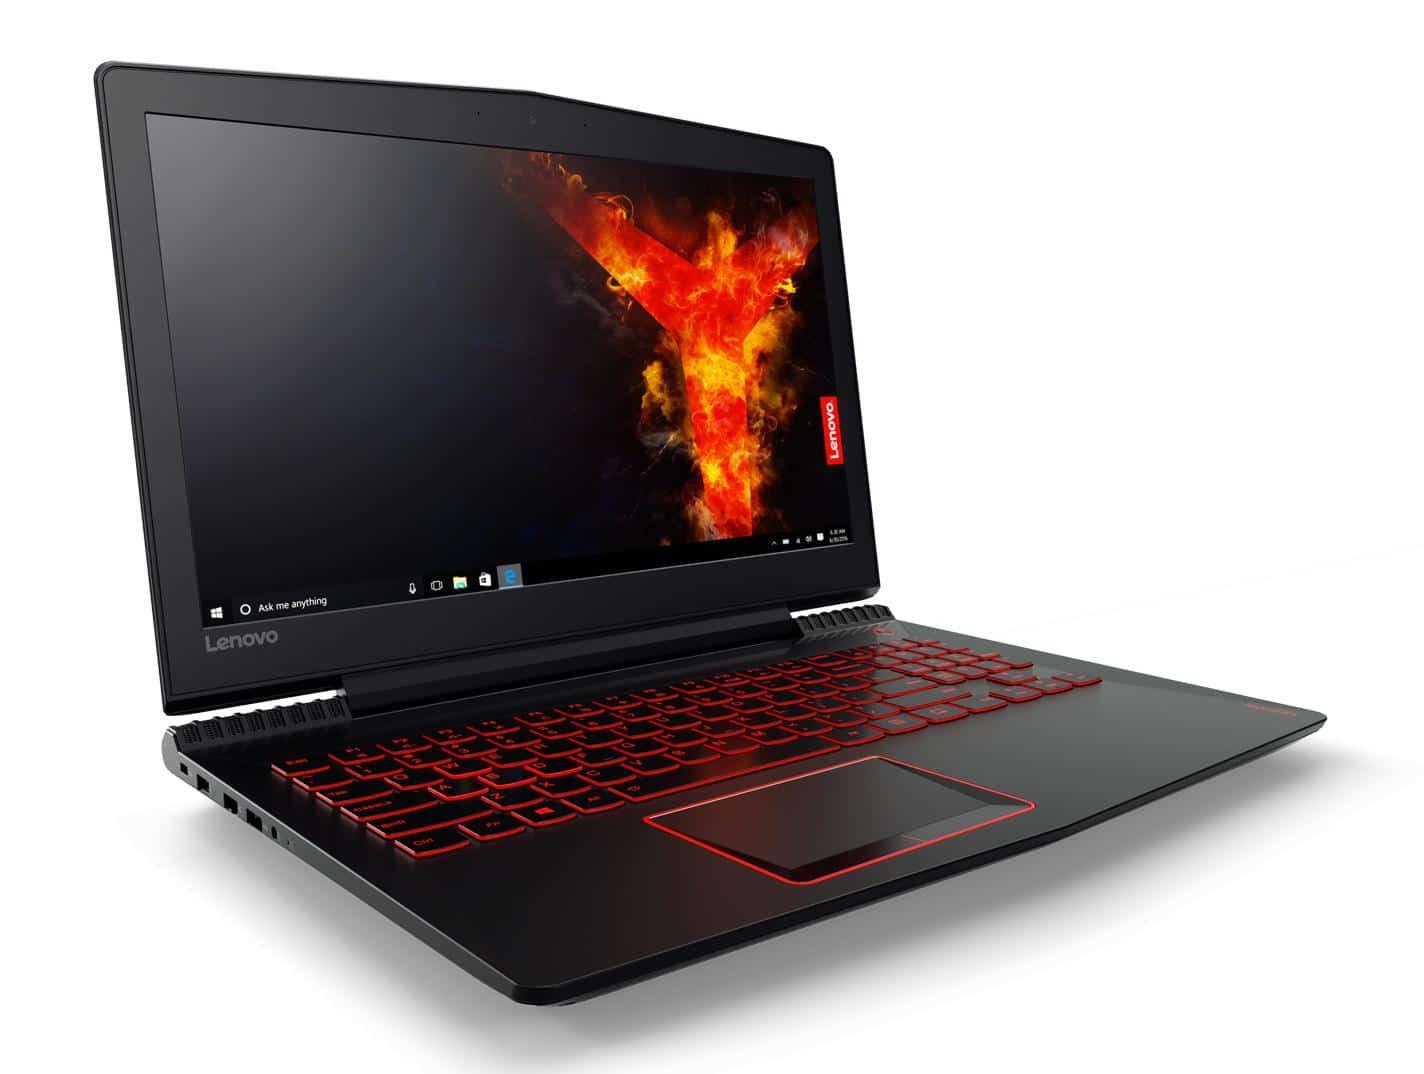 Lenovo Legion Y520-15IKBA, PC portable 15 pouces IPS SSD256 i5 RX 560 à 850€